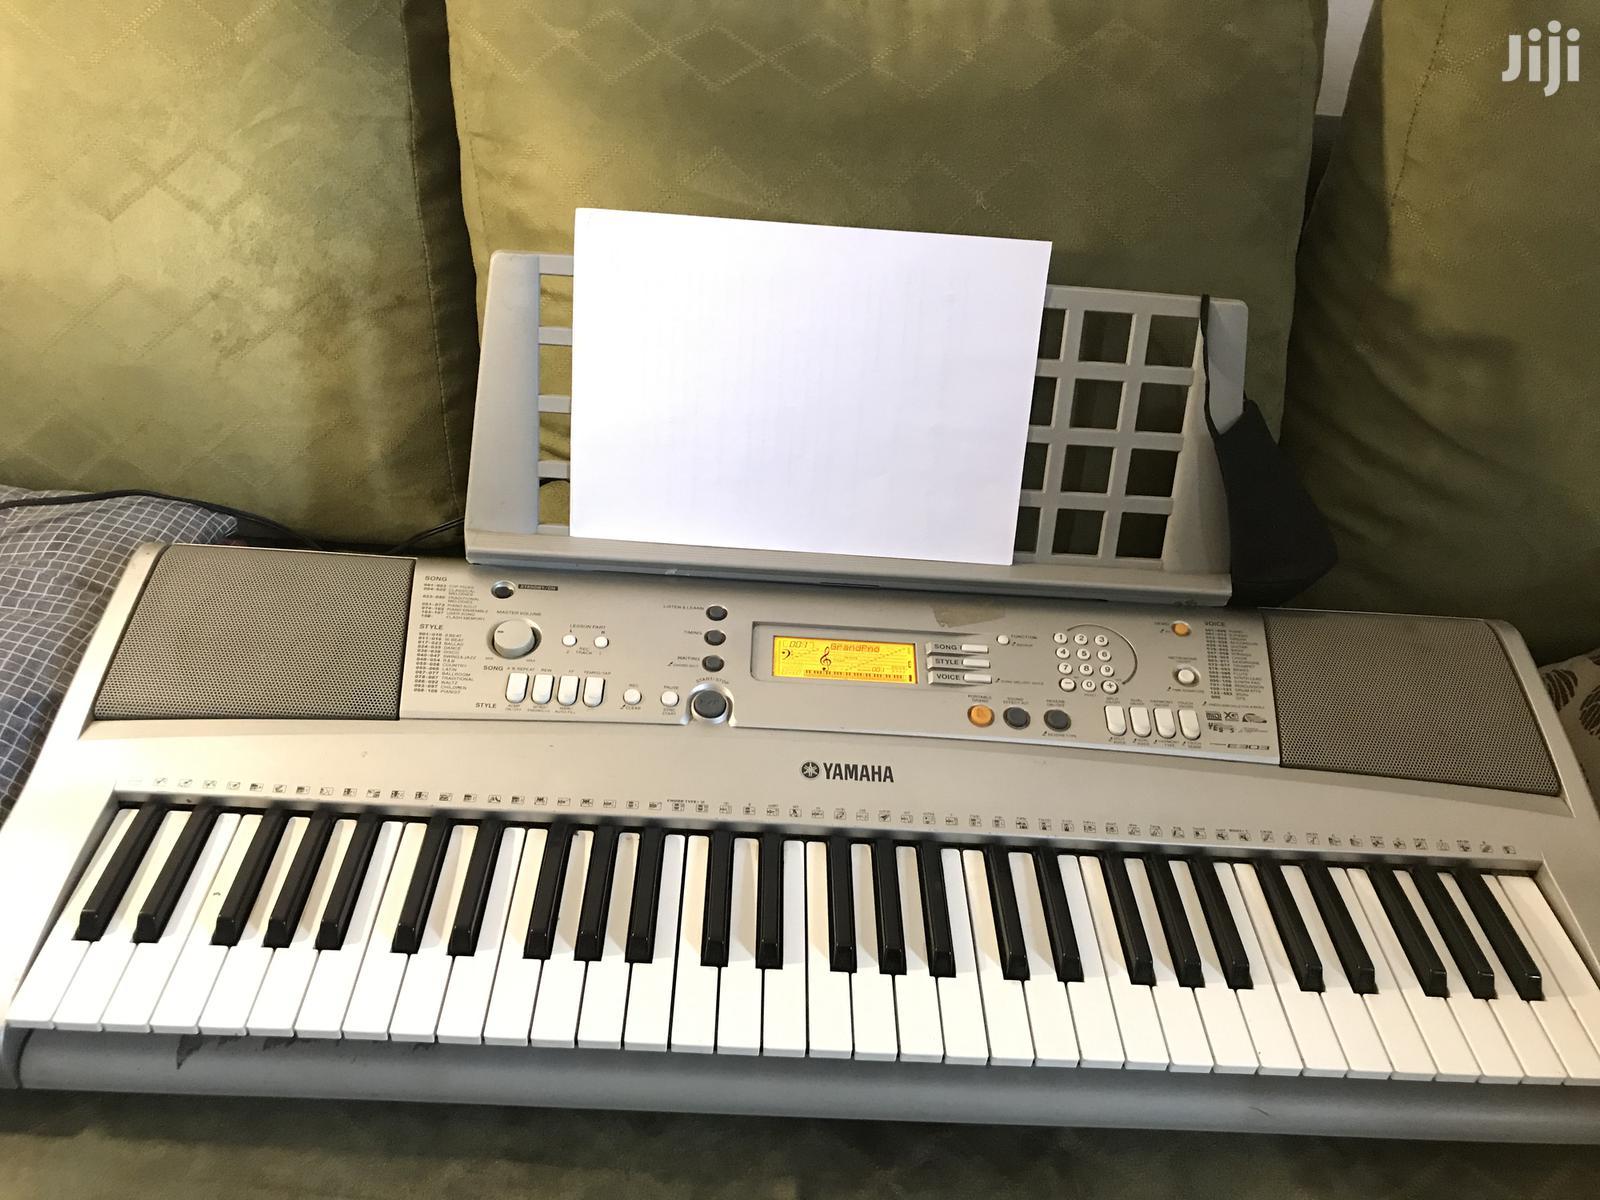 Yamaha Music Keyboard Piano